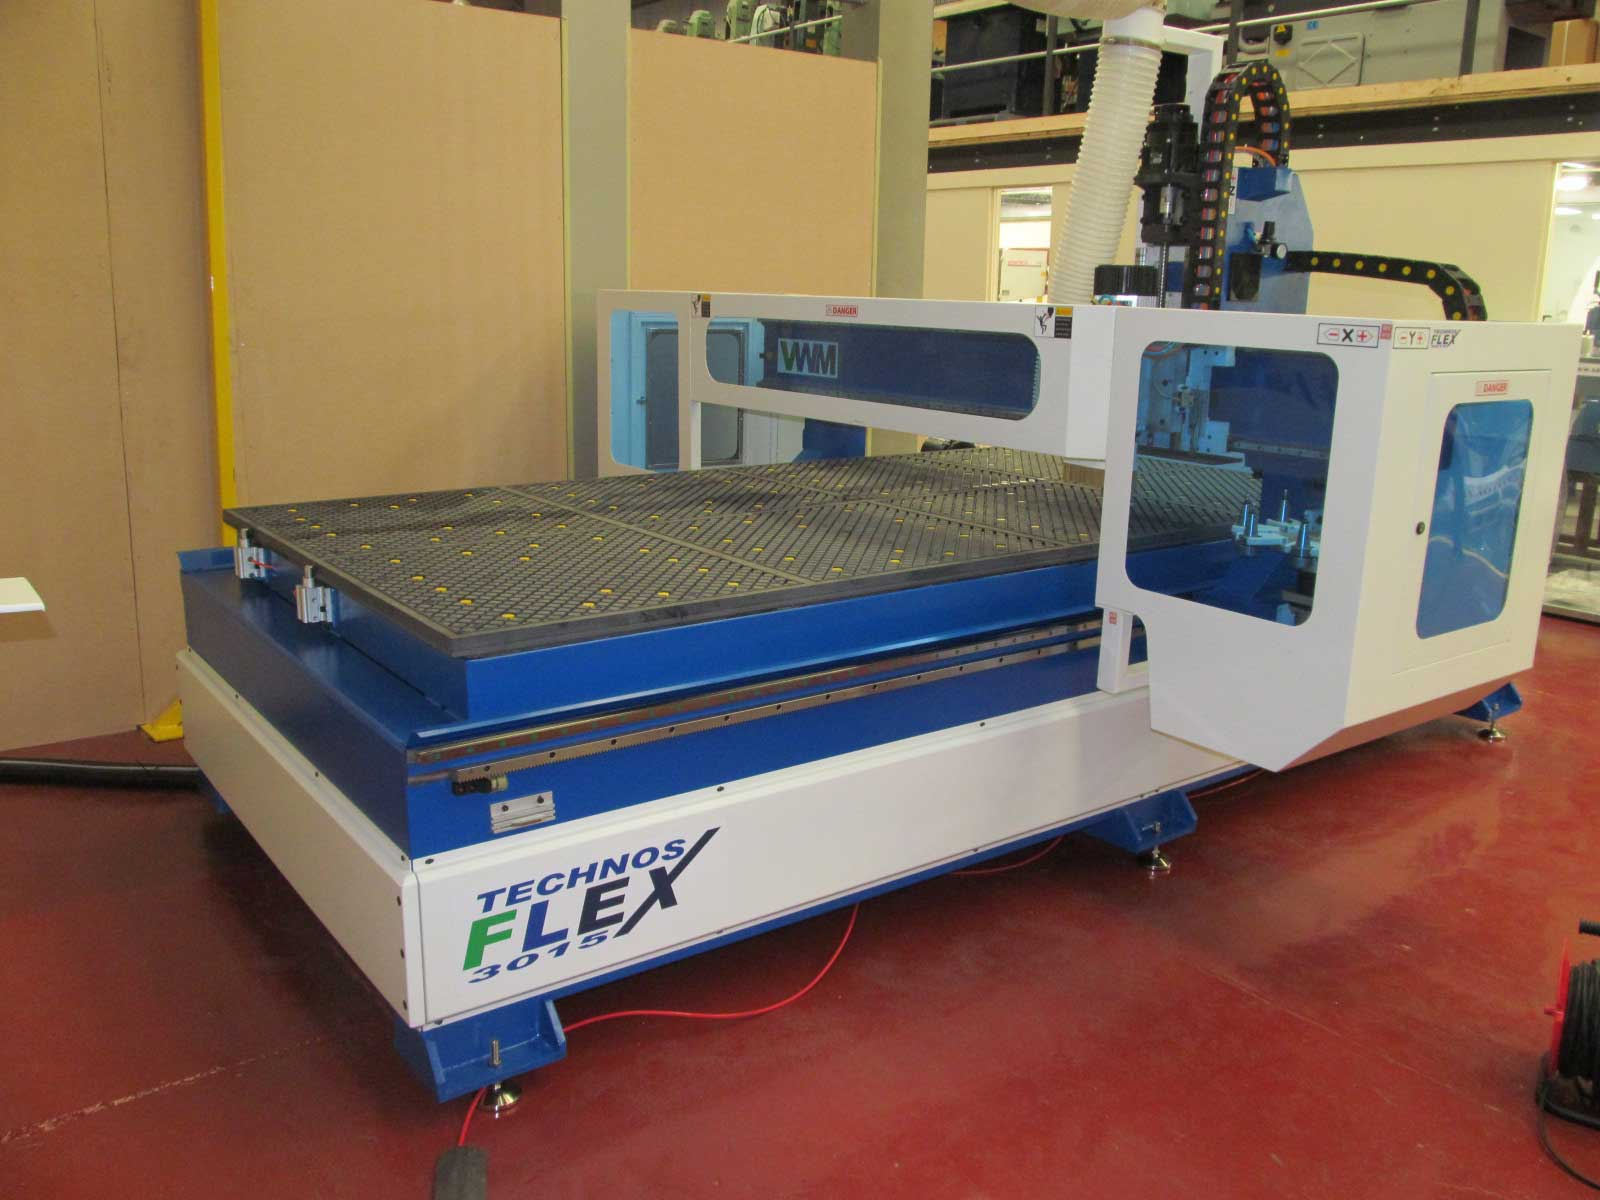 Technos 3015 Flexx HD nesting CNC Router